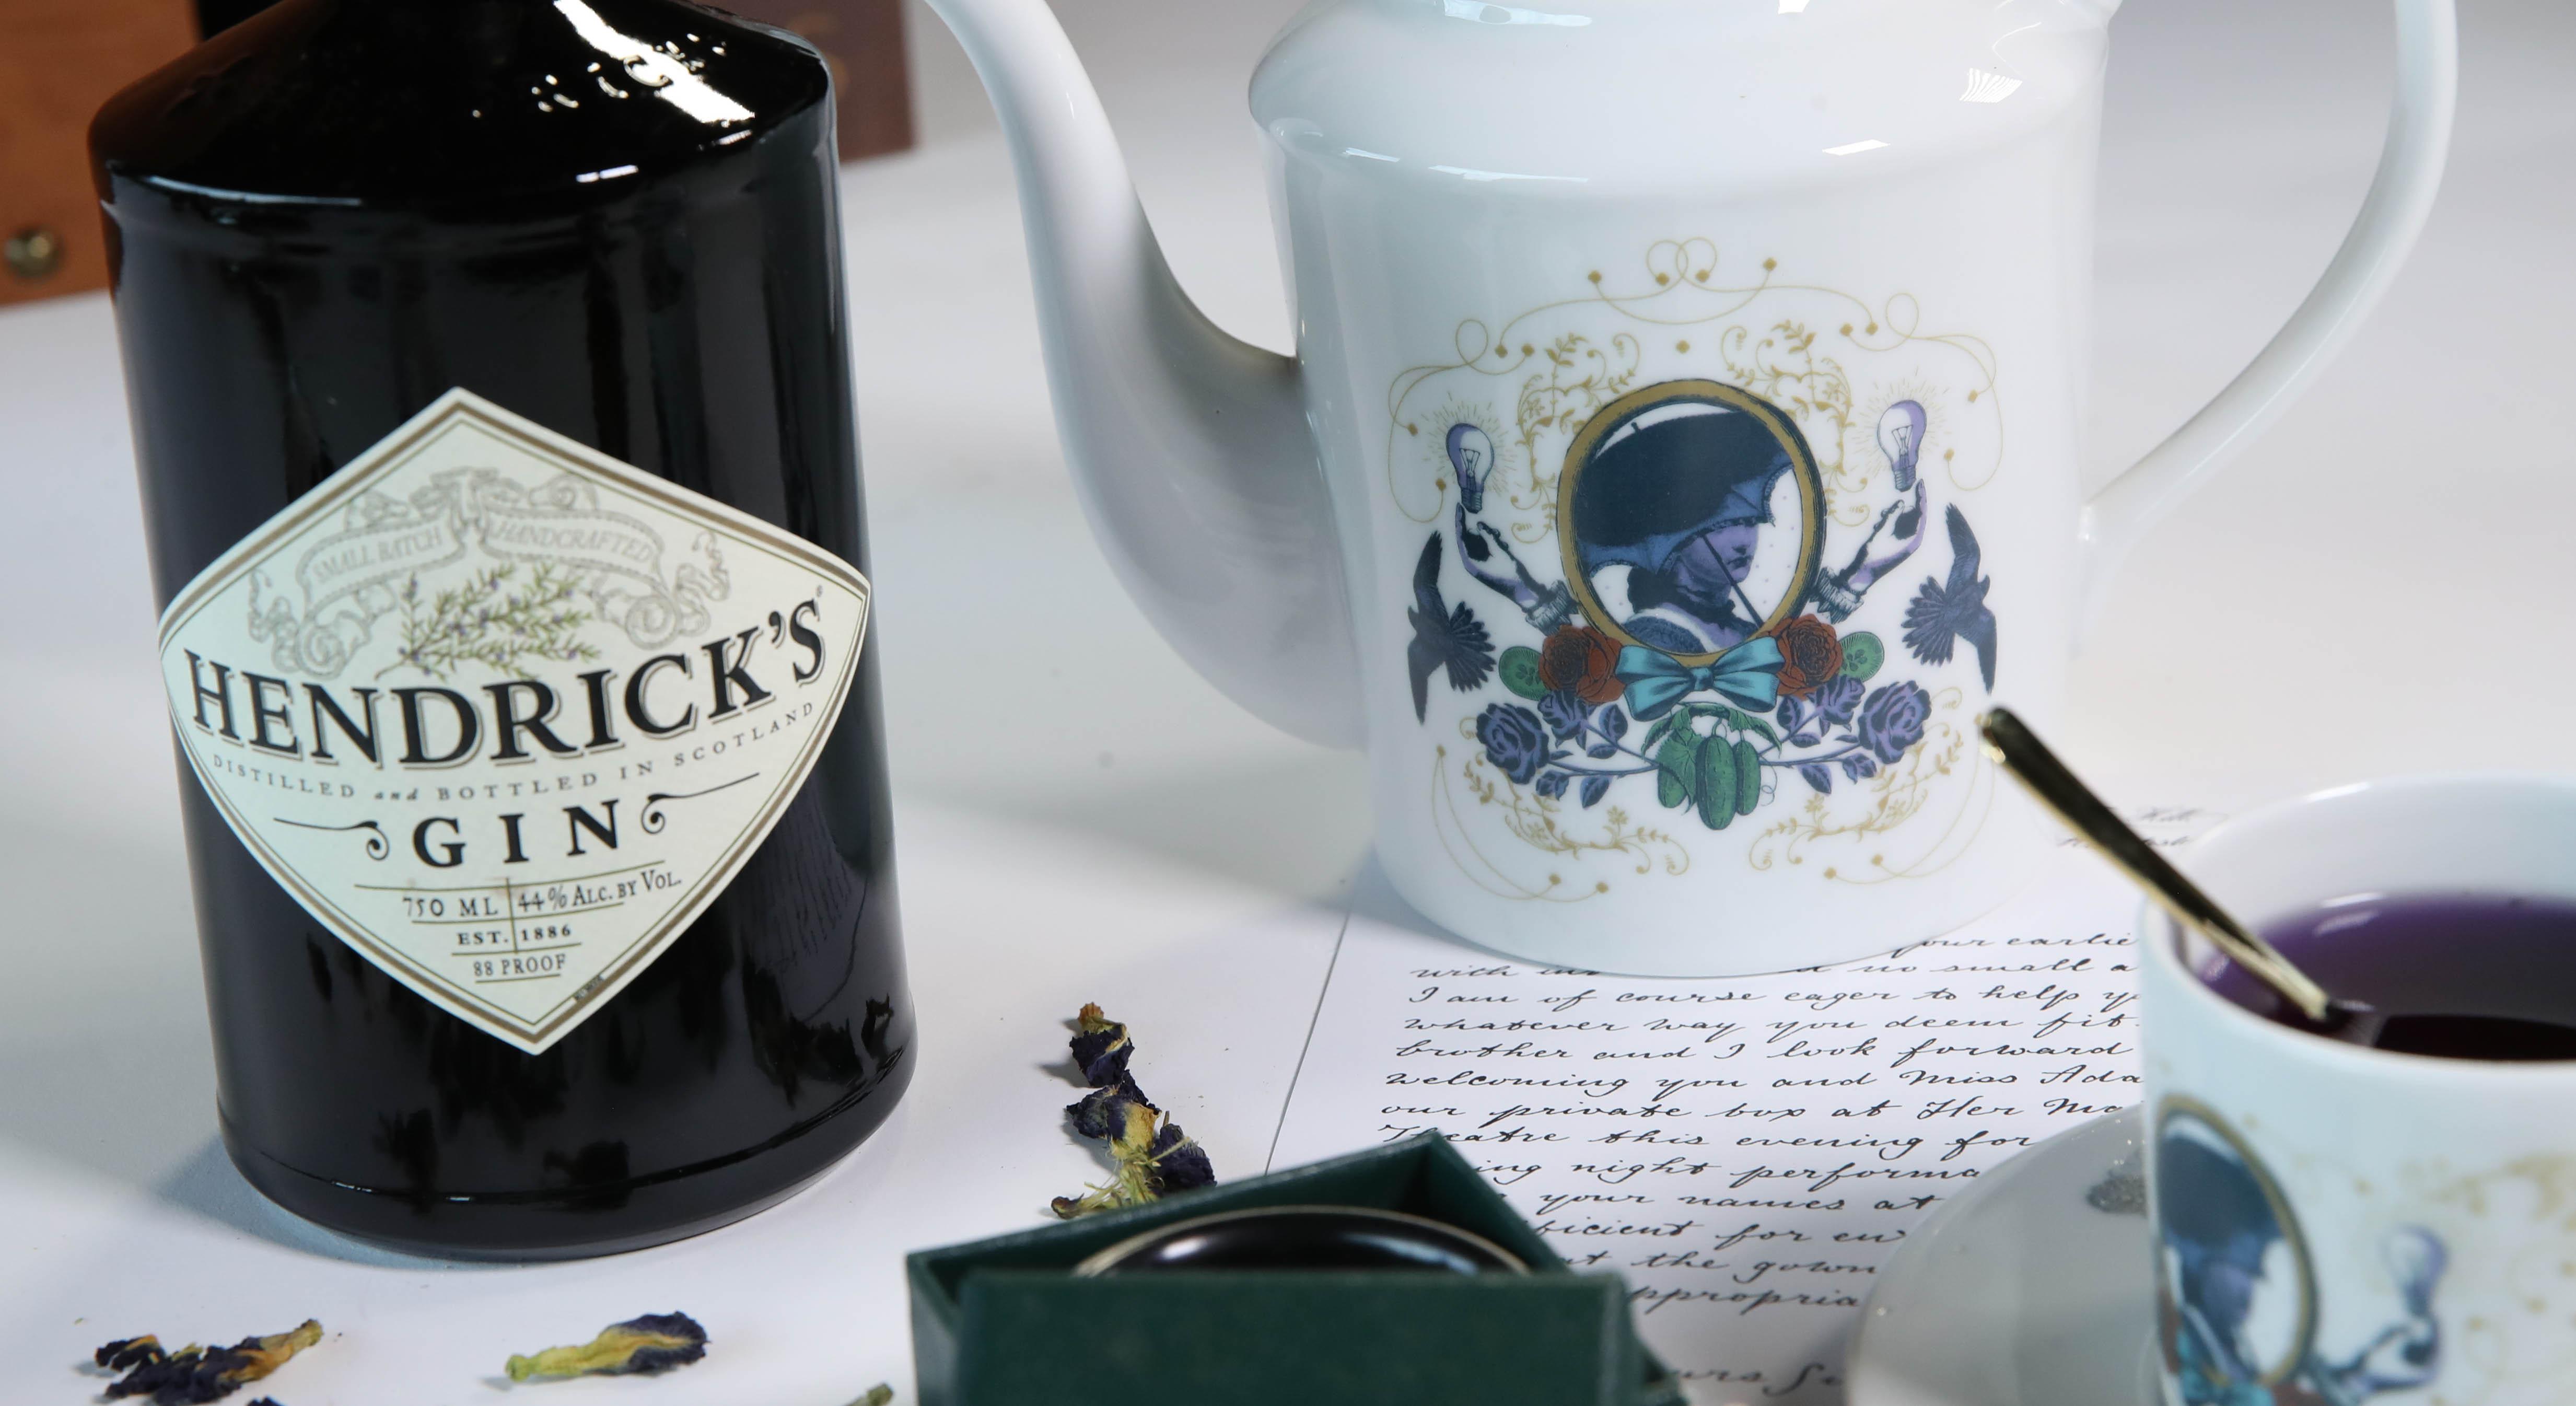 HBO Hendricks Tea